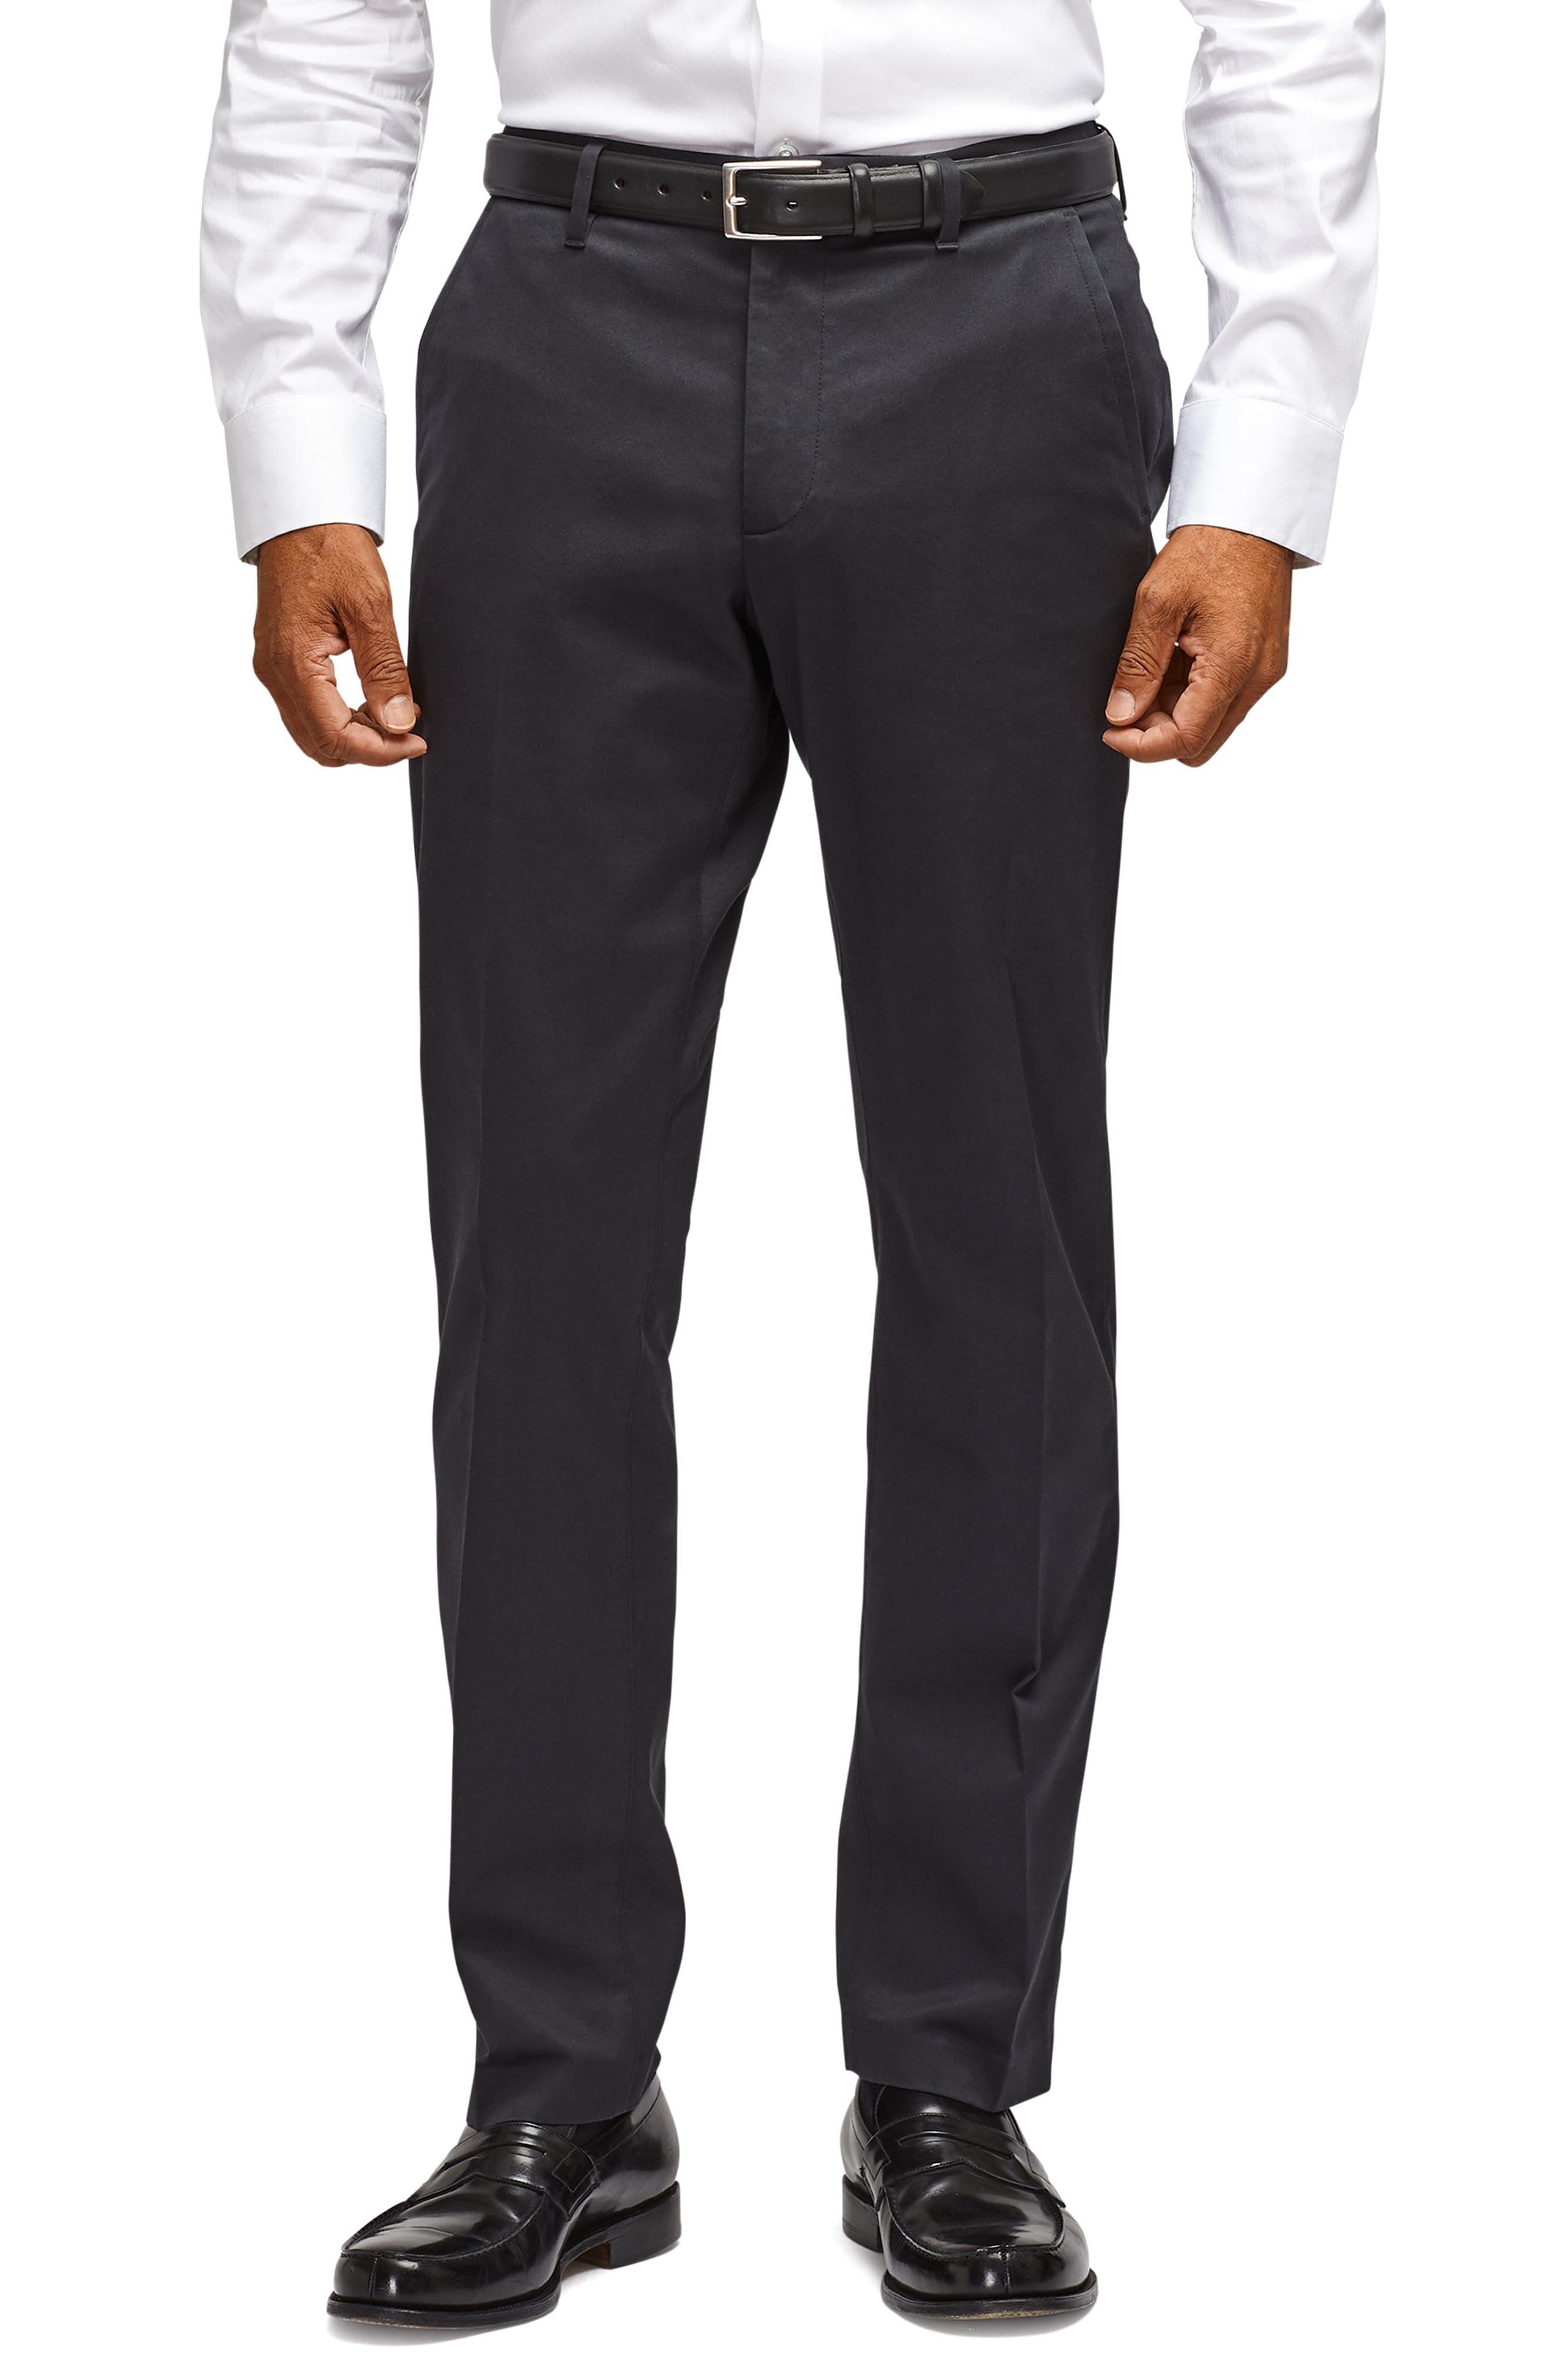 Men S Bonobos Weekday Warrior Tailored Fit Stretch Pants Size 30 X 30 Black Slim Fit Dress Pants Slim Fit Dresses Fitted Dress Pants [ 4048 x 2640 Pixel ]